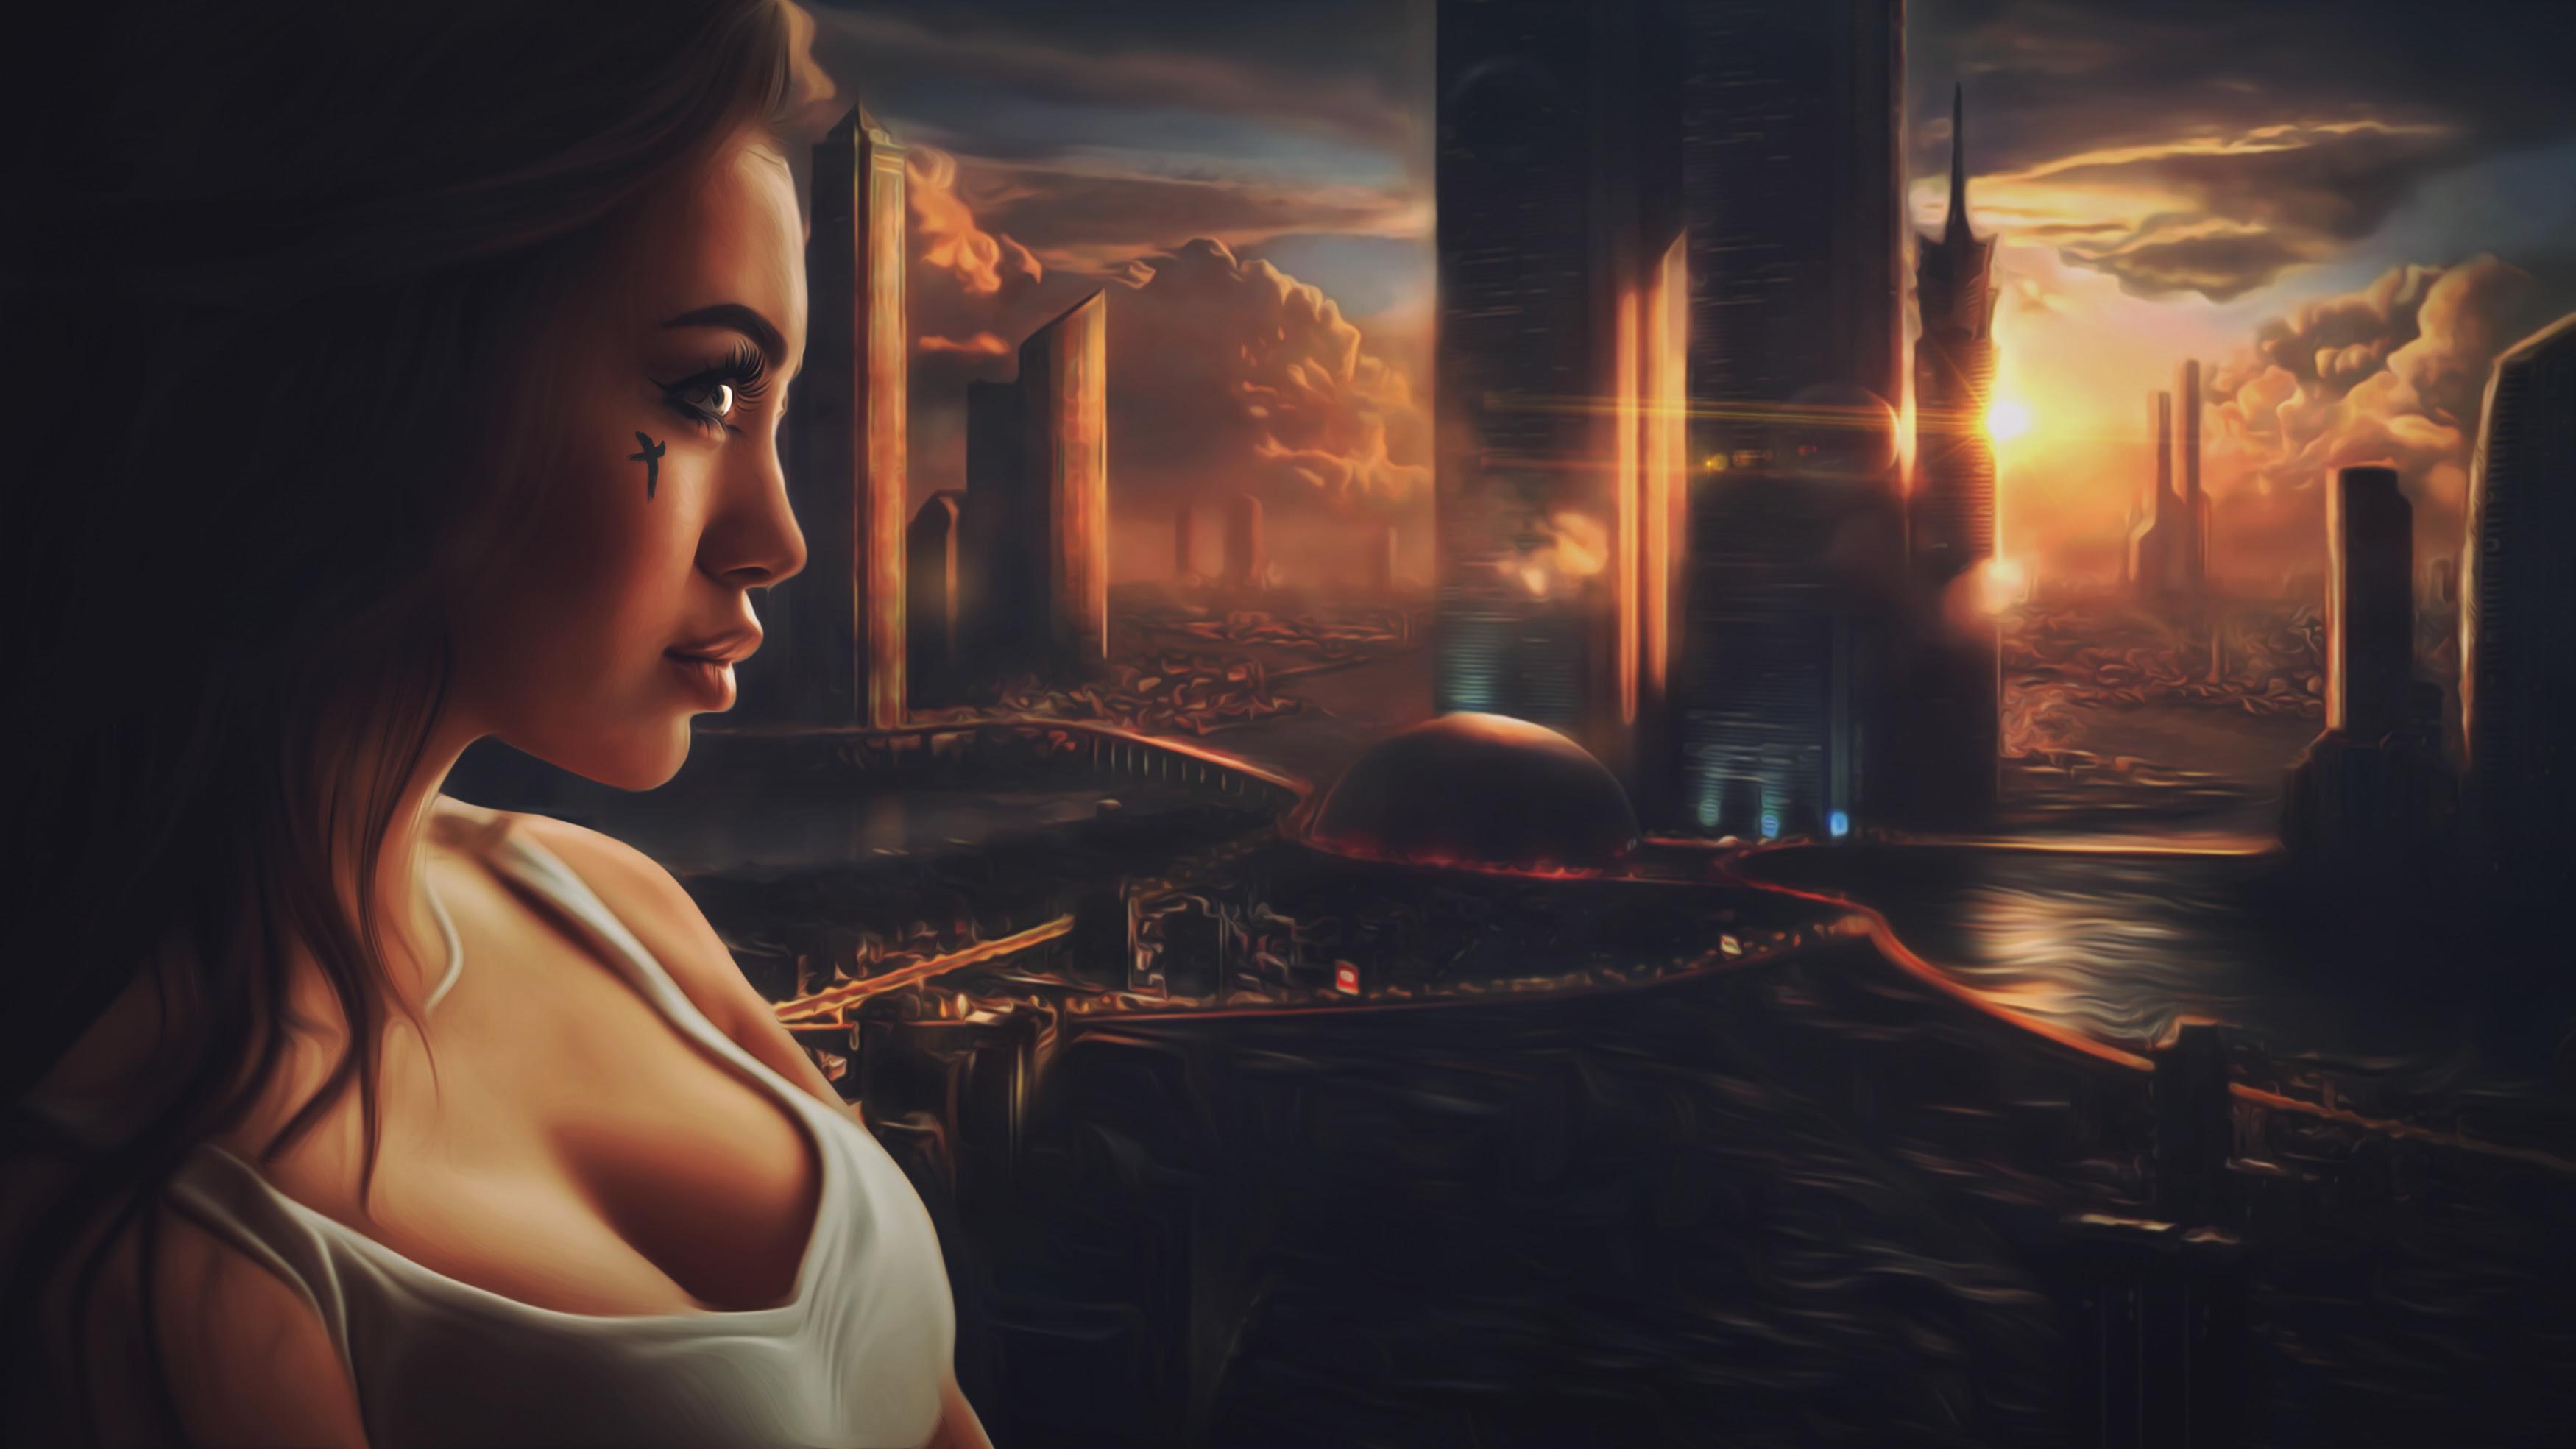 Beautiful Sci Fi Girl Wallpapers Hd Wallpapers